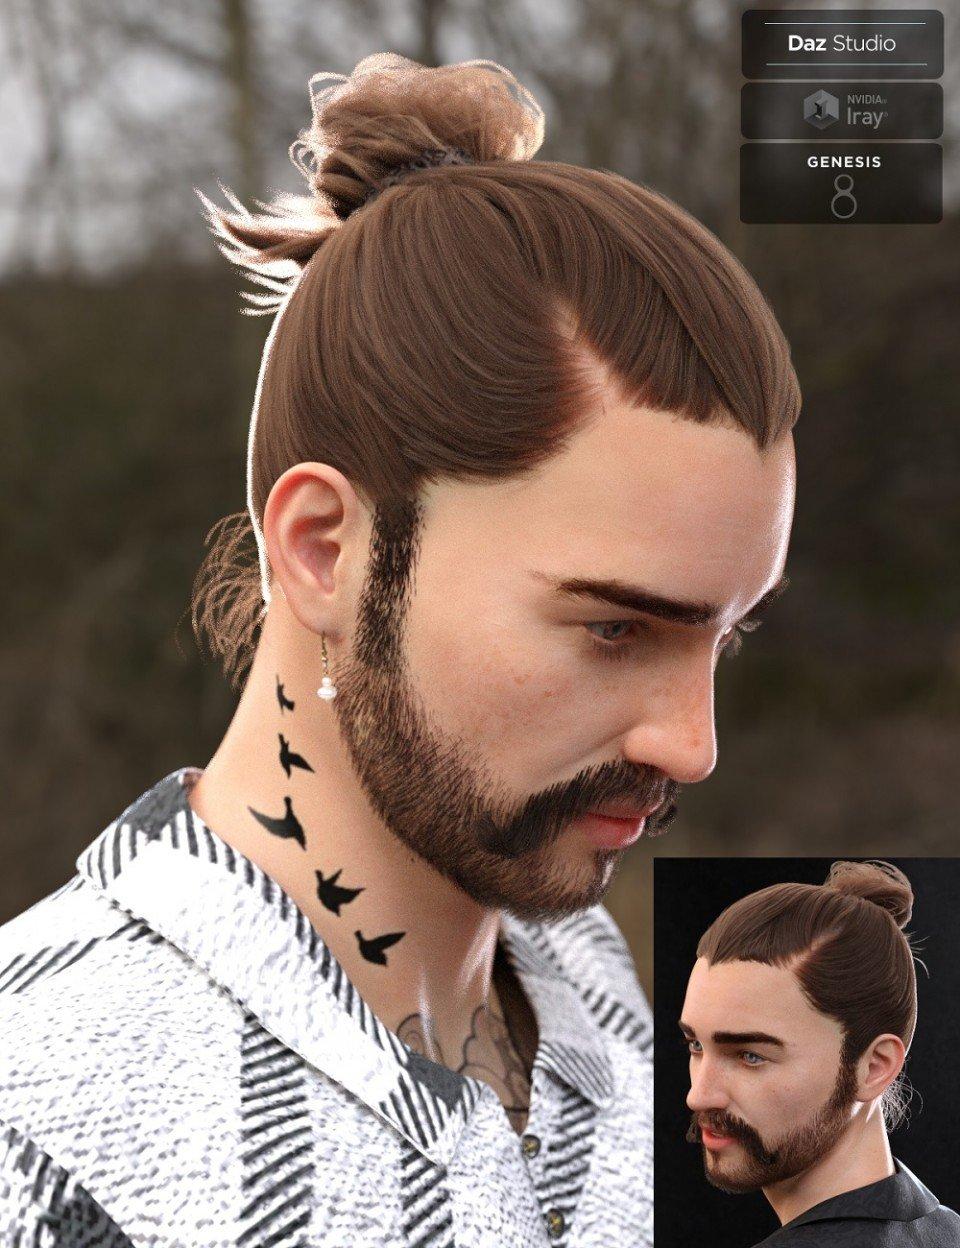 Yvanovich Bun Hair and Beard for Genesis 8 Male(s)_DAZ3D下载站